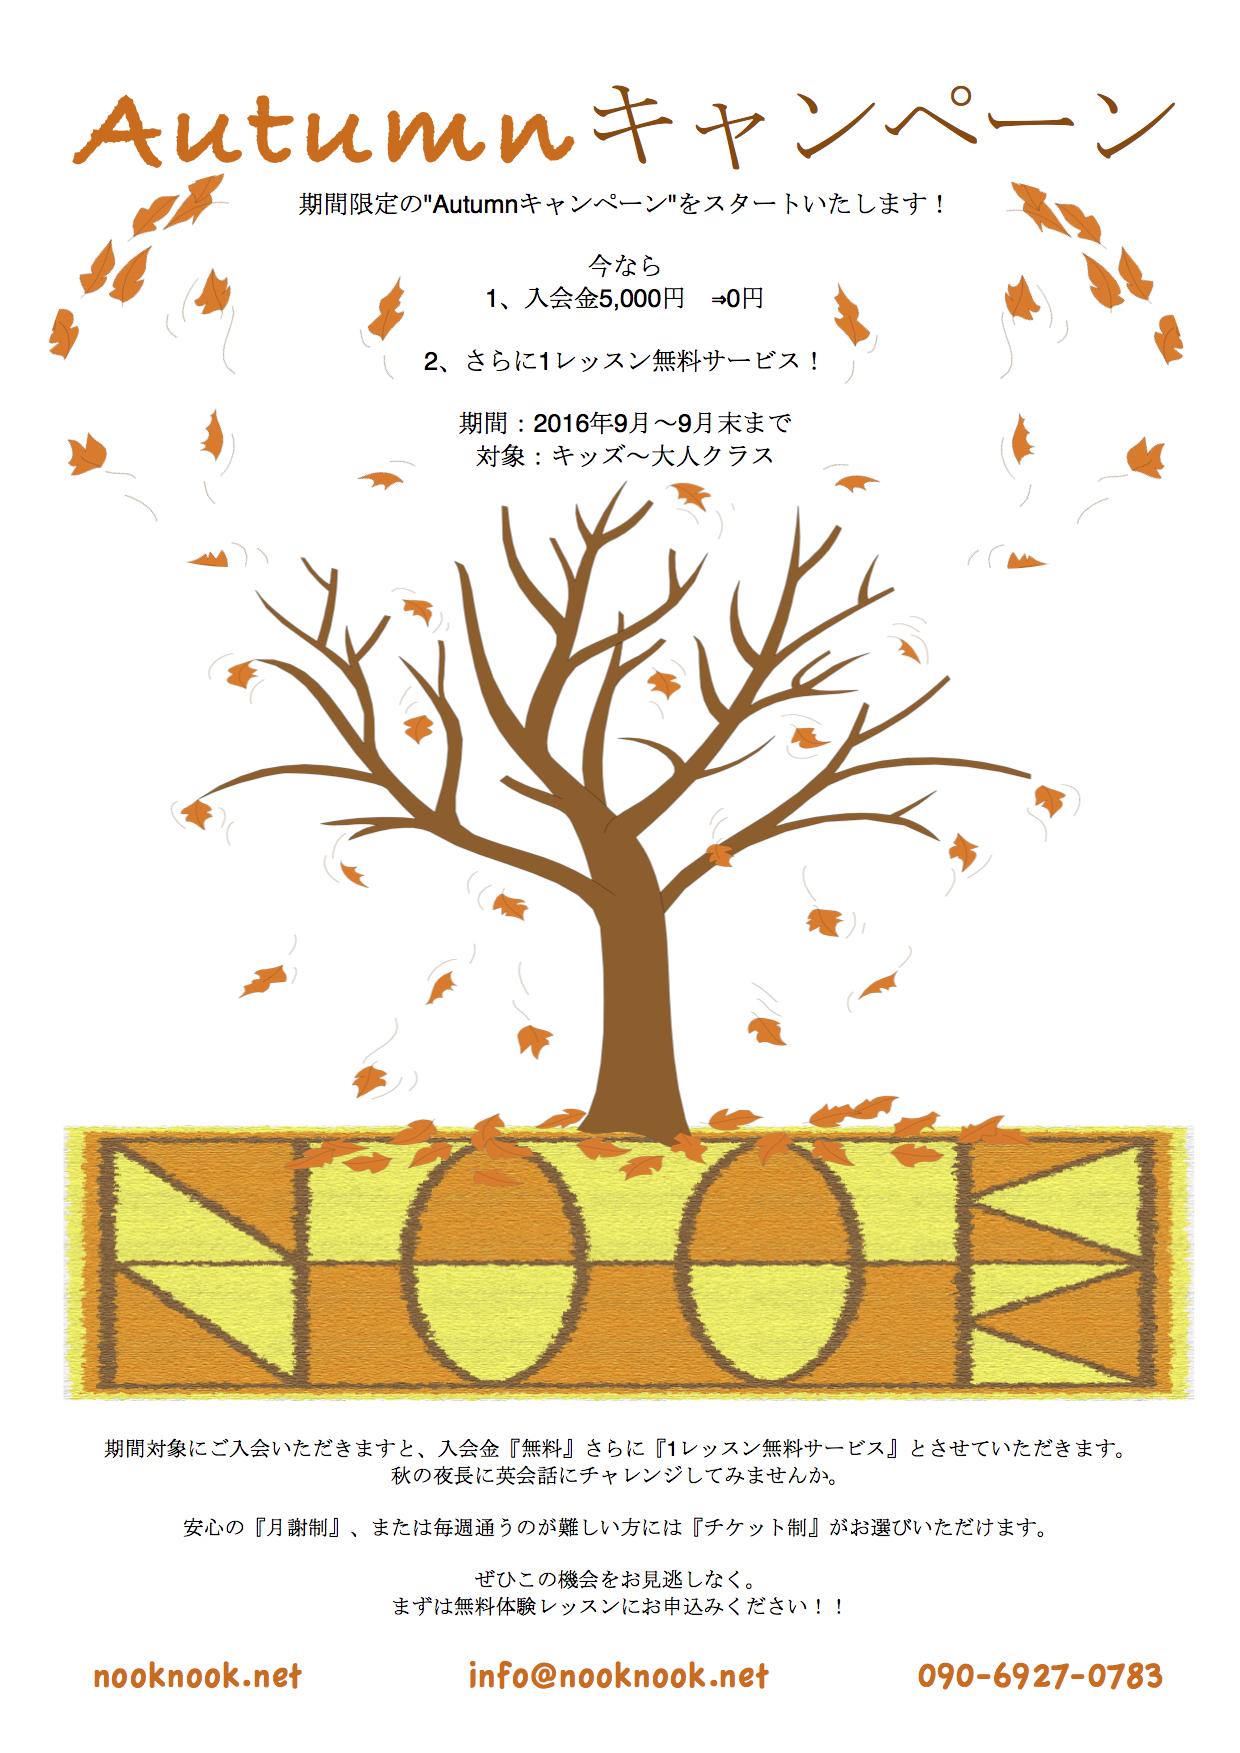 2016 Autumn Campaign